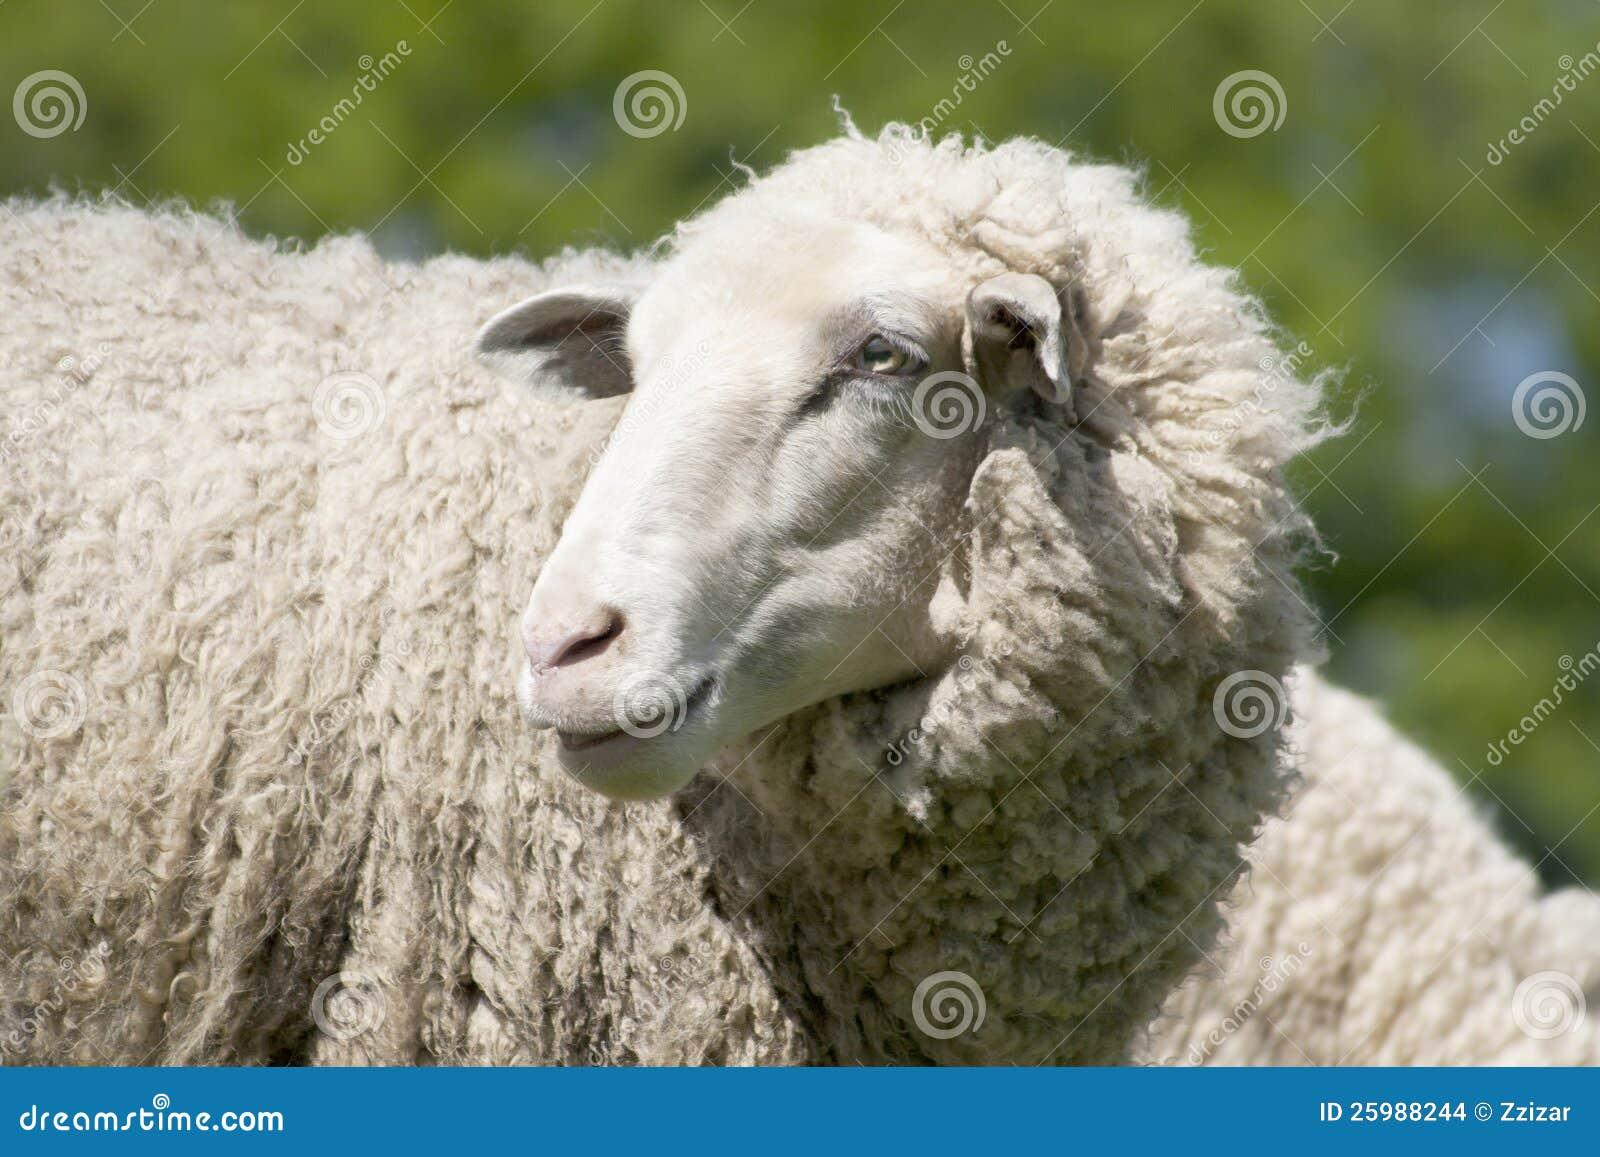 White sheep - photo#13